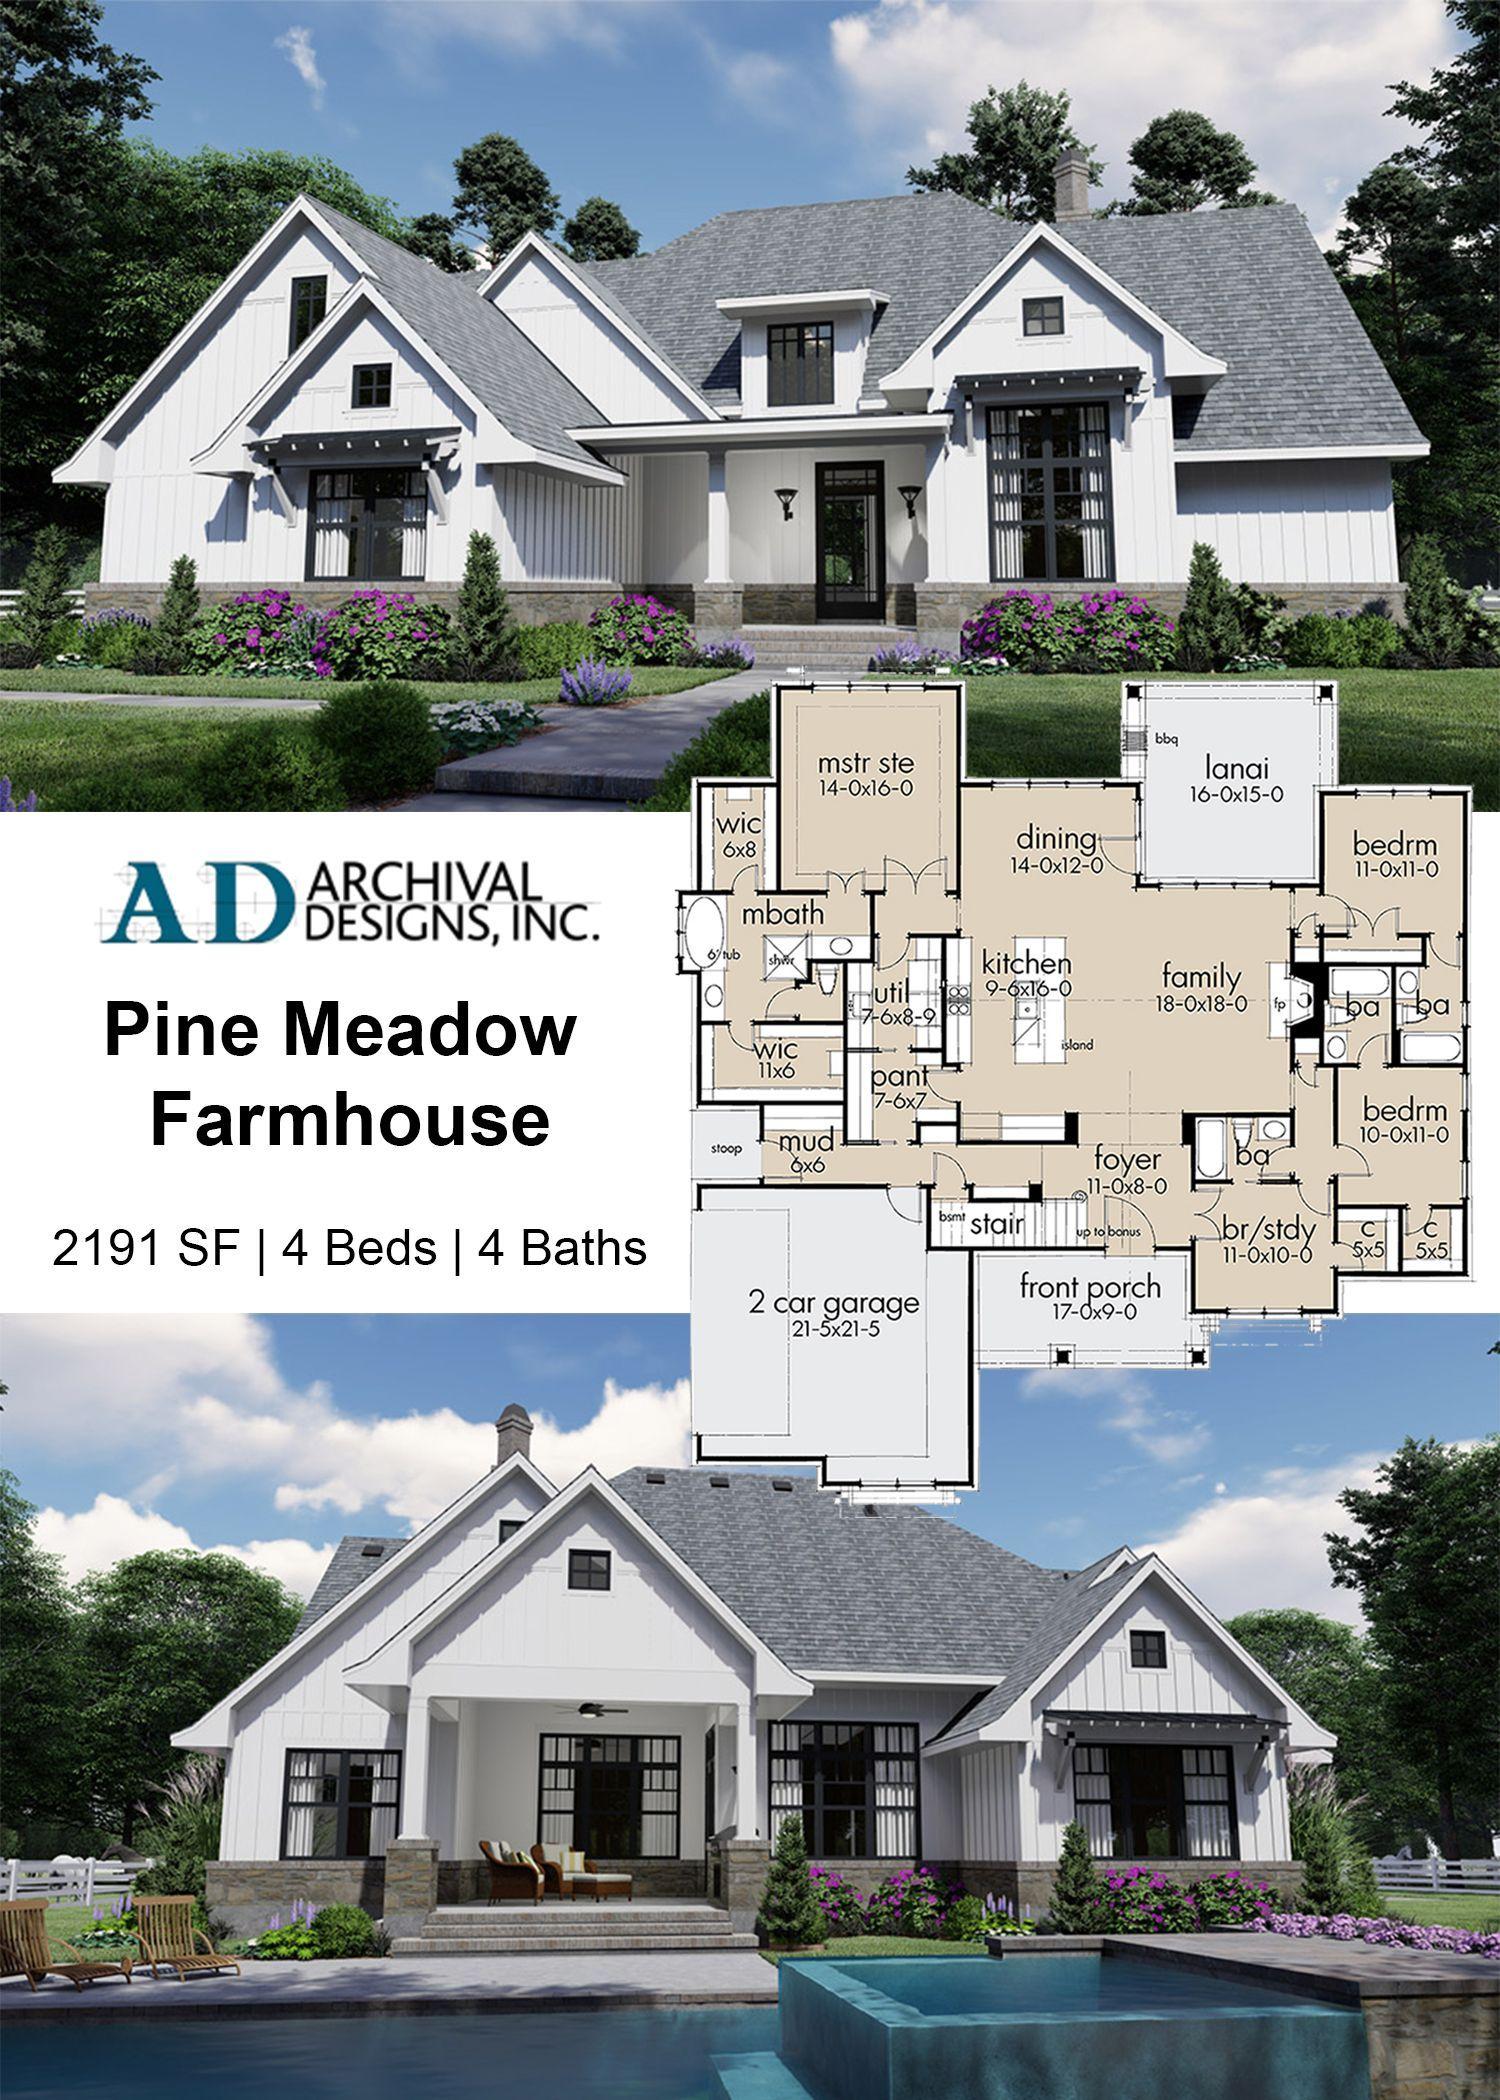 Pine Meadow Farmhouse Plan In 2020 Farmhouse Plans House Plans House Plans Farmhouse